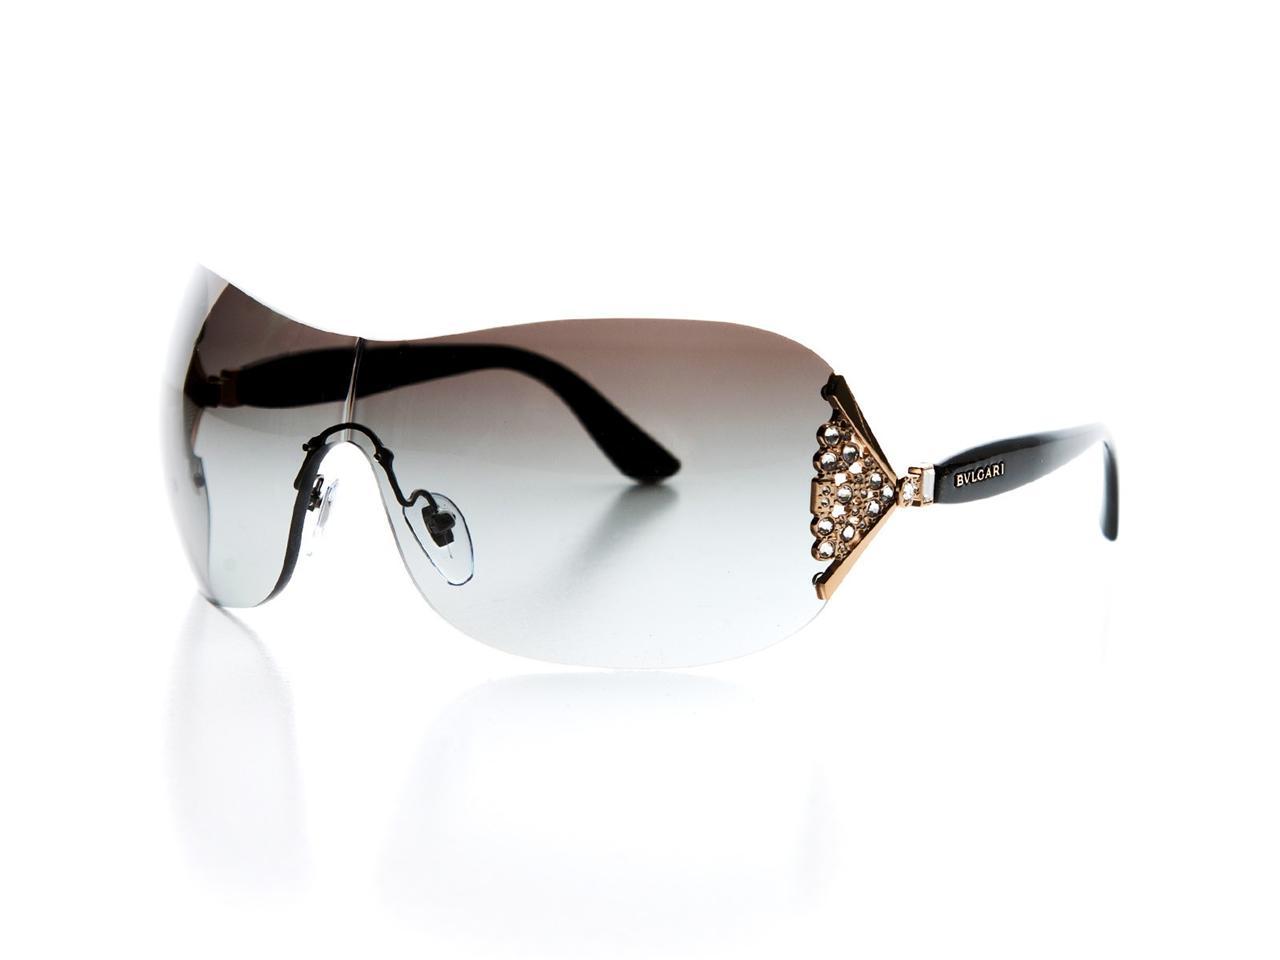 Bvlgari Sunglasses Gold Frame : NEW Bvlgari Womens Sunglasses BV 6061B 376 8G Black Gold ...